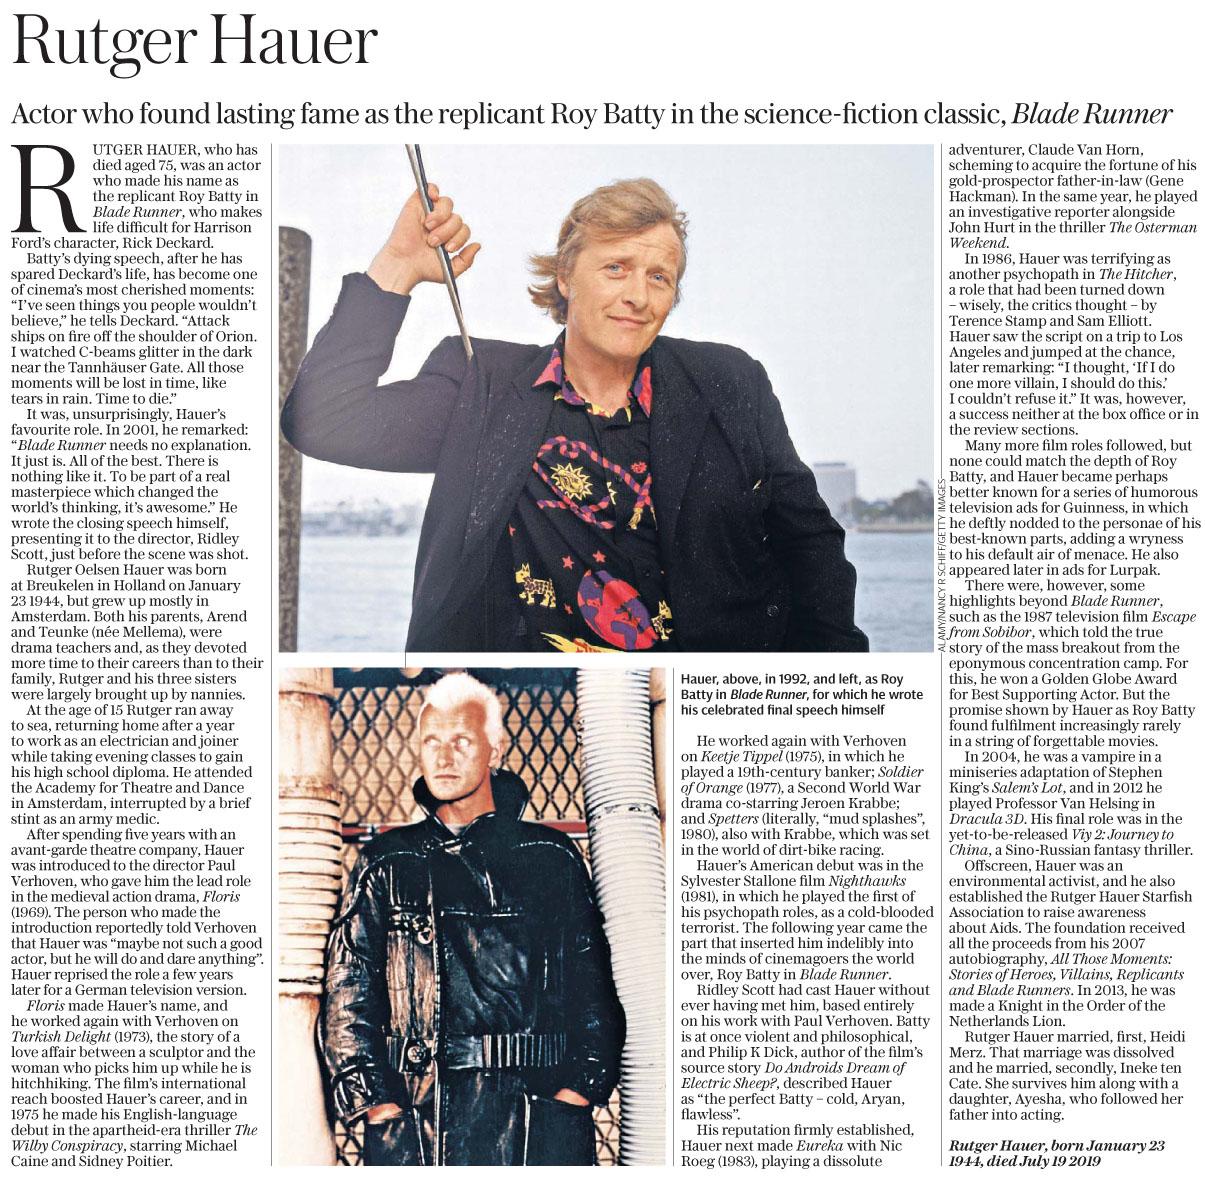 The Daily Telegraph  July 25 2019 RHauer.jpg